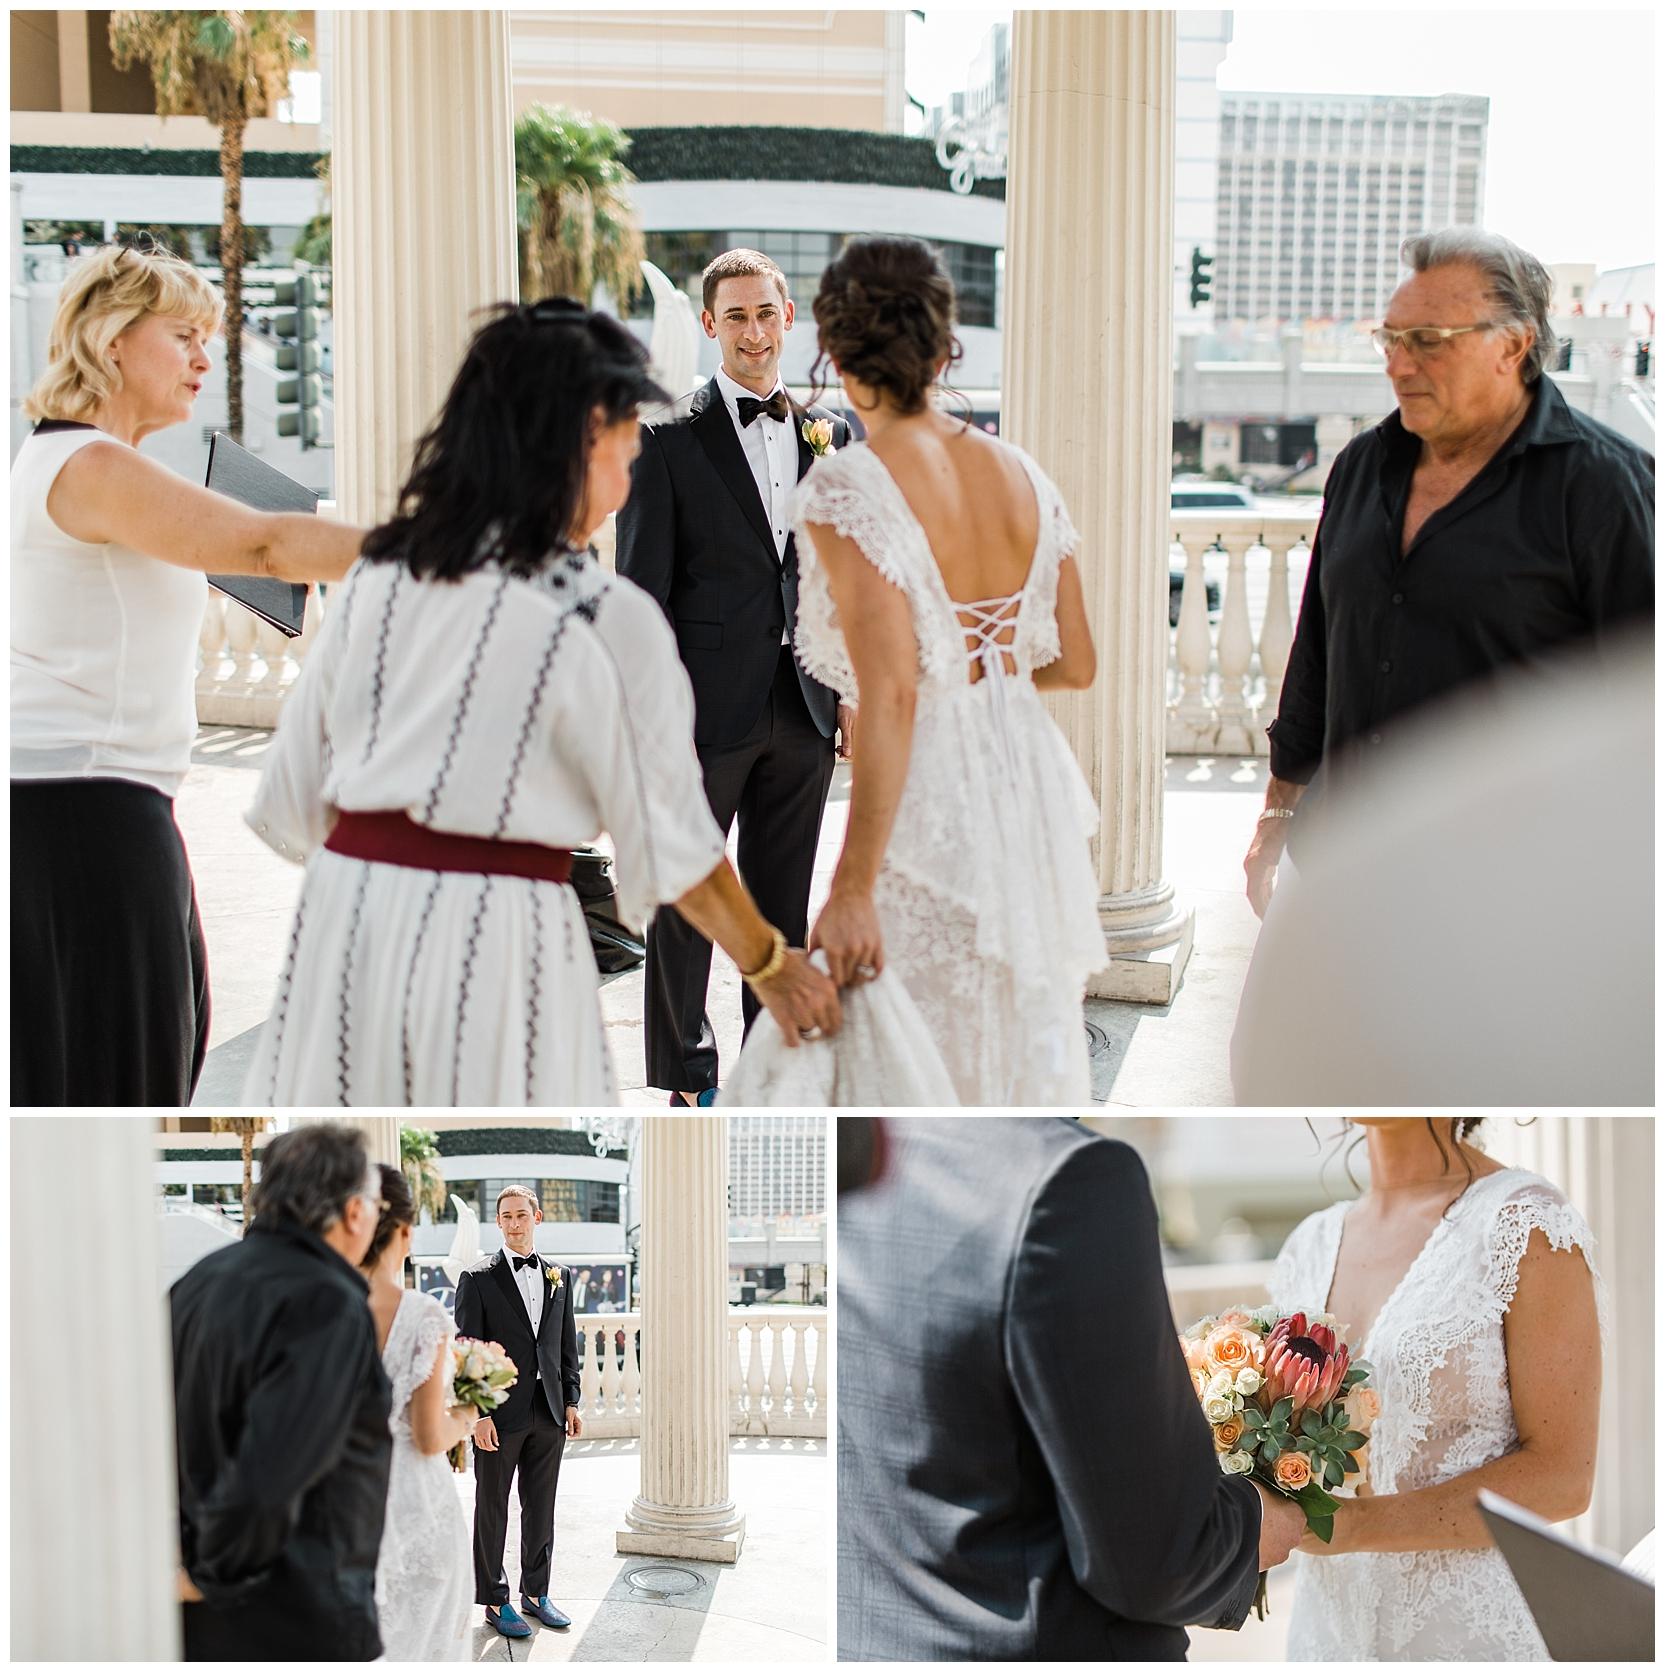 Las-Vegas-Elopement-Photographer-Lindsey-Ramdin-Best-Vegas-Wedding-Photographer (51 of 173).jpg